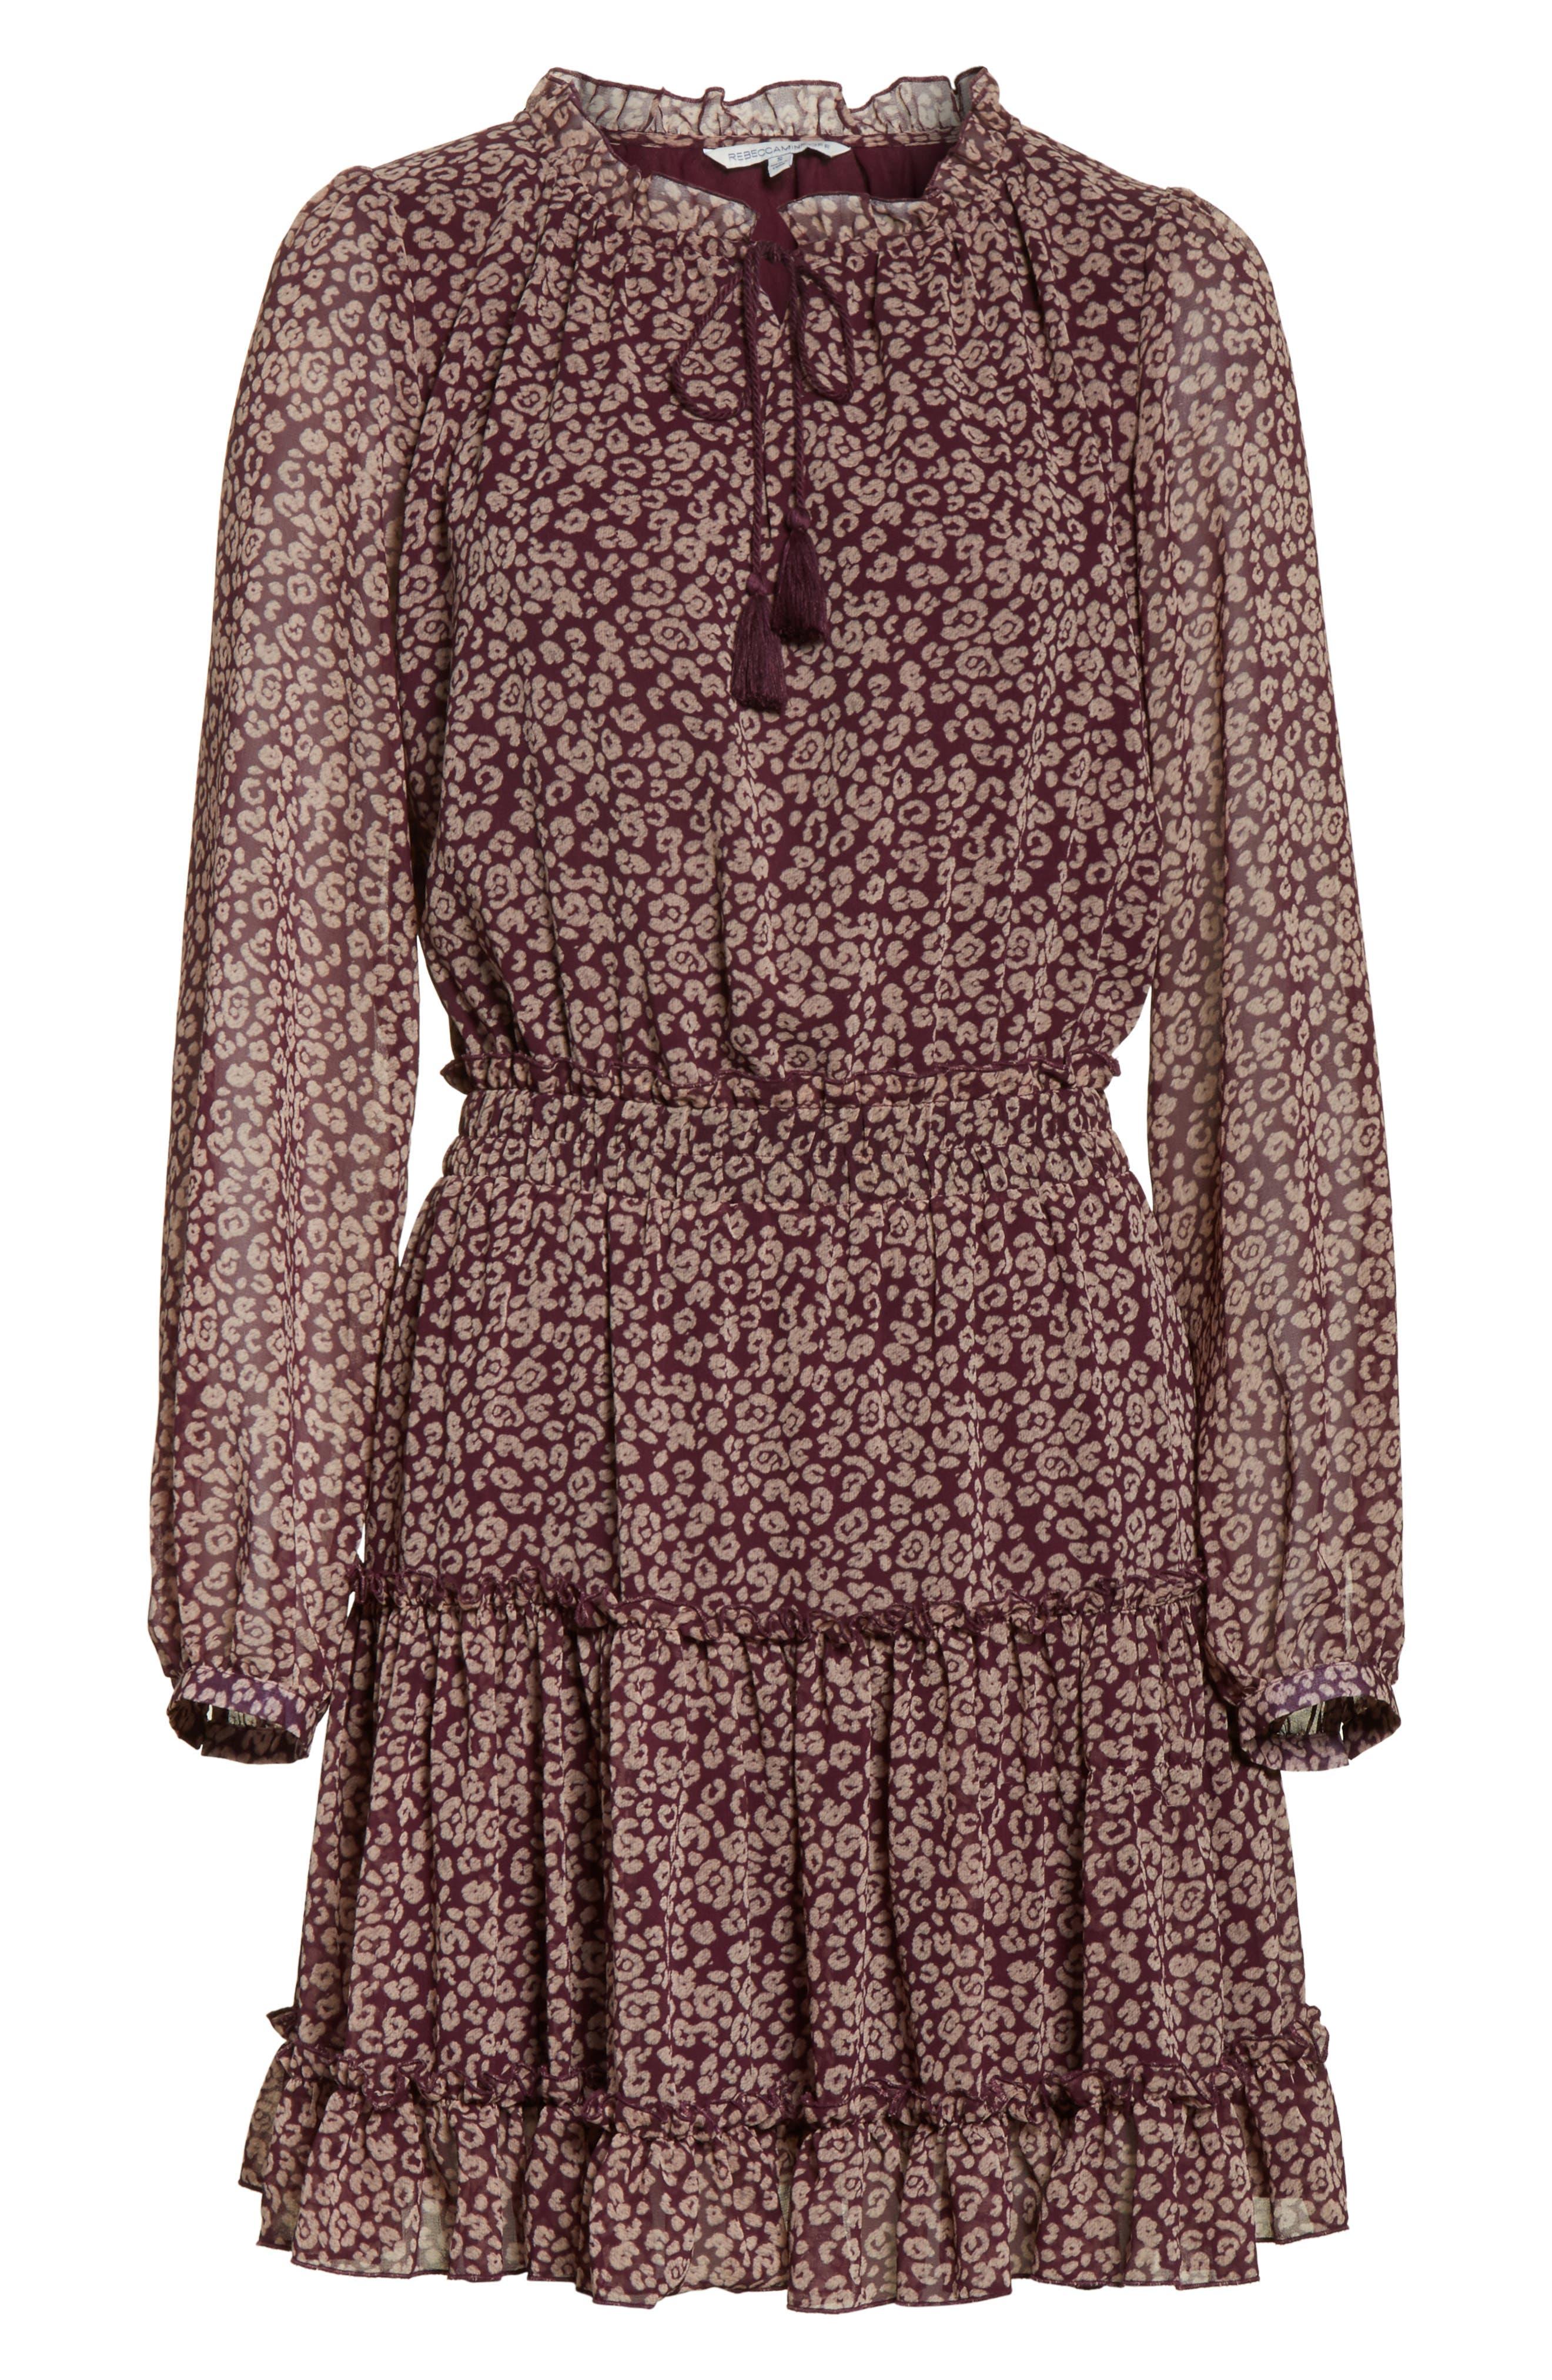 Rosemary A-Line Dress,                             Alternate thumbnail 6, color,                             531